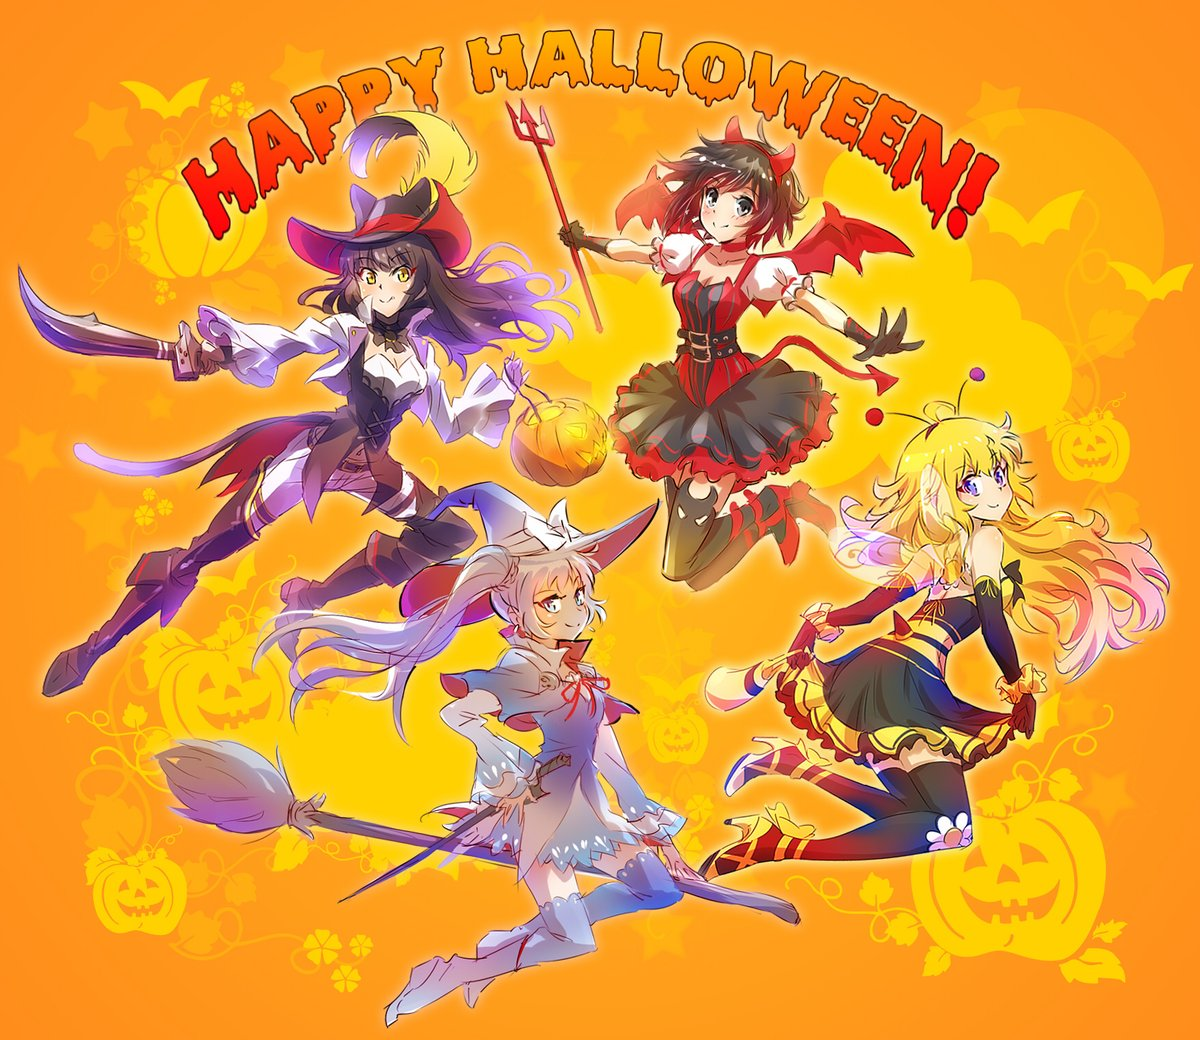 ALOWEE 0) Yellow Cartoon Anime